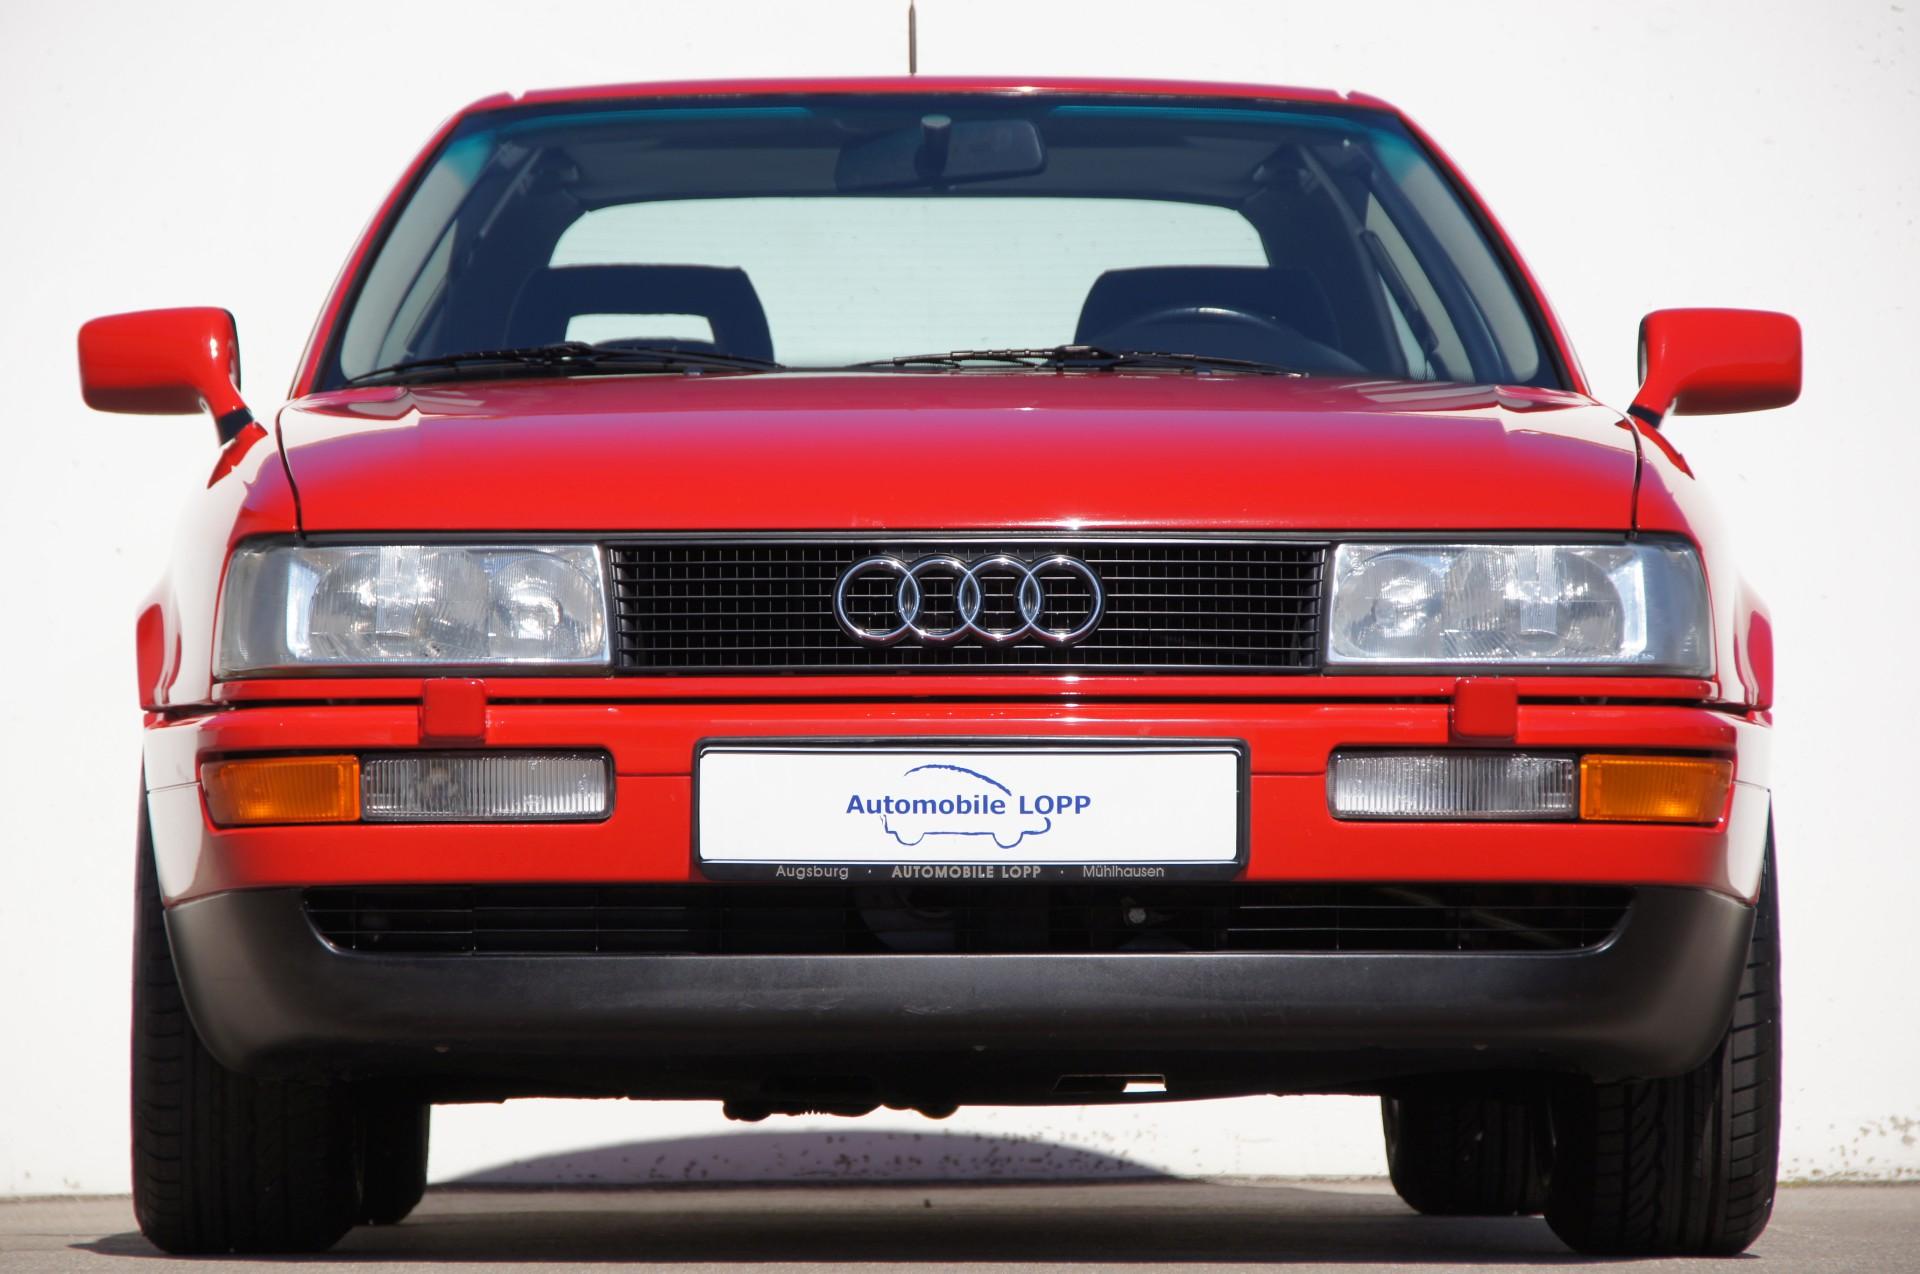 Audi Coupe Quattro 20V 1989   Automobile Lopp in Mühlhausen